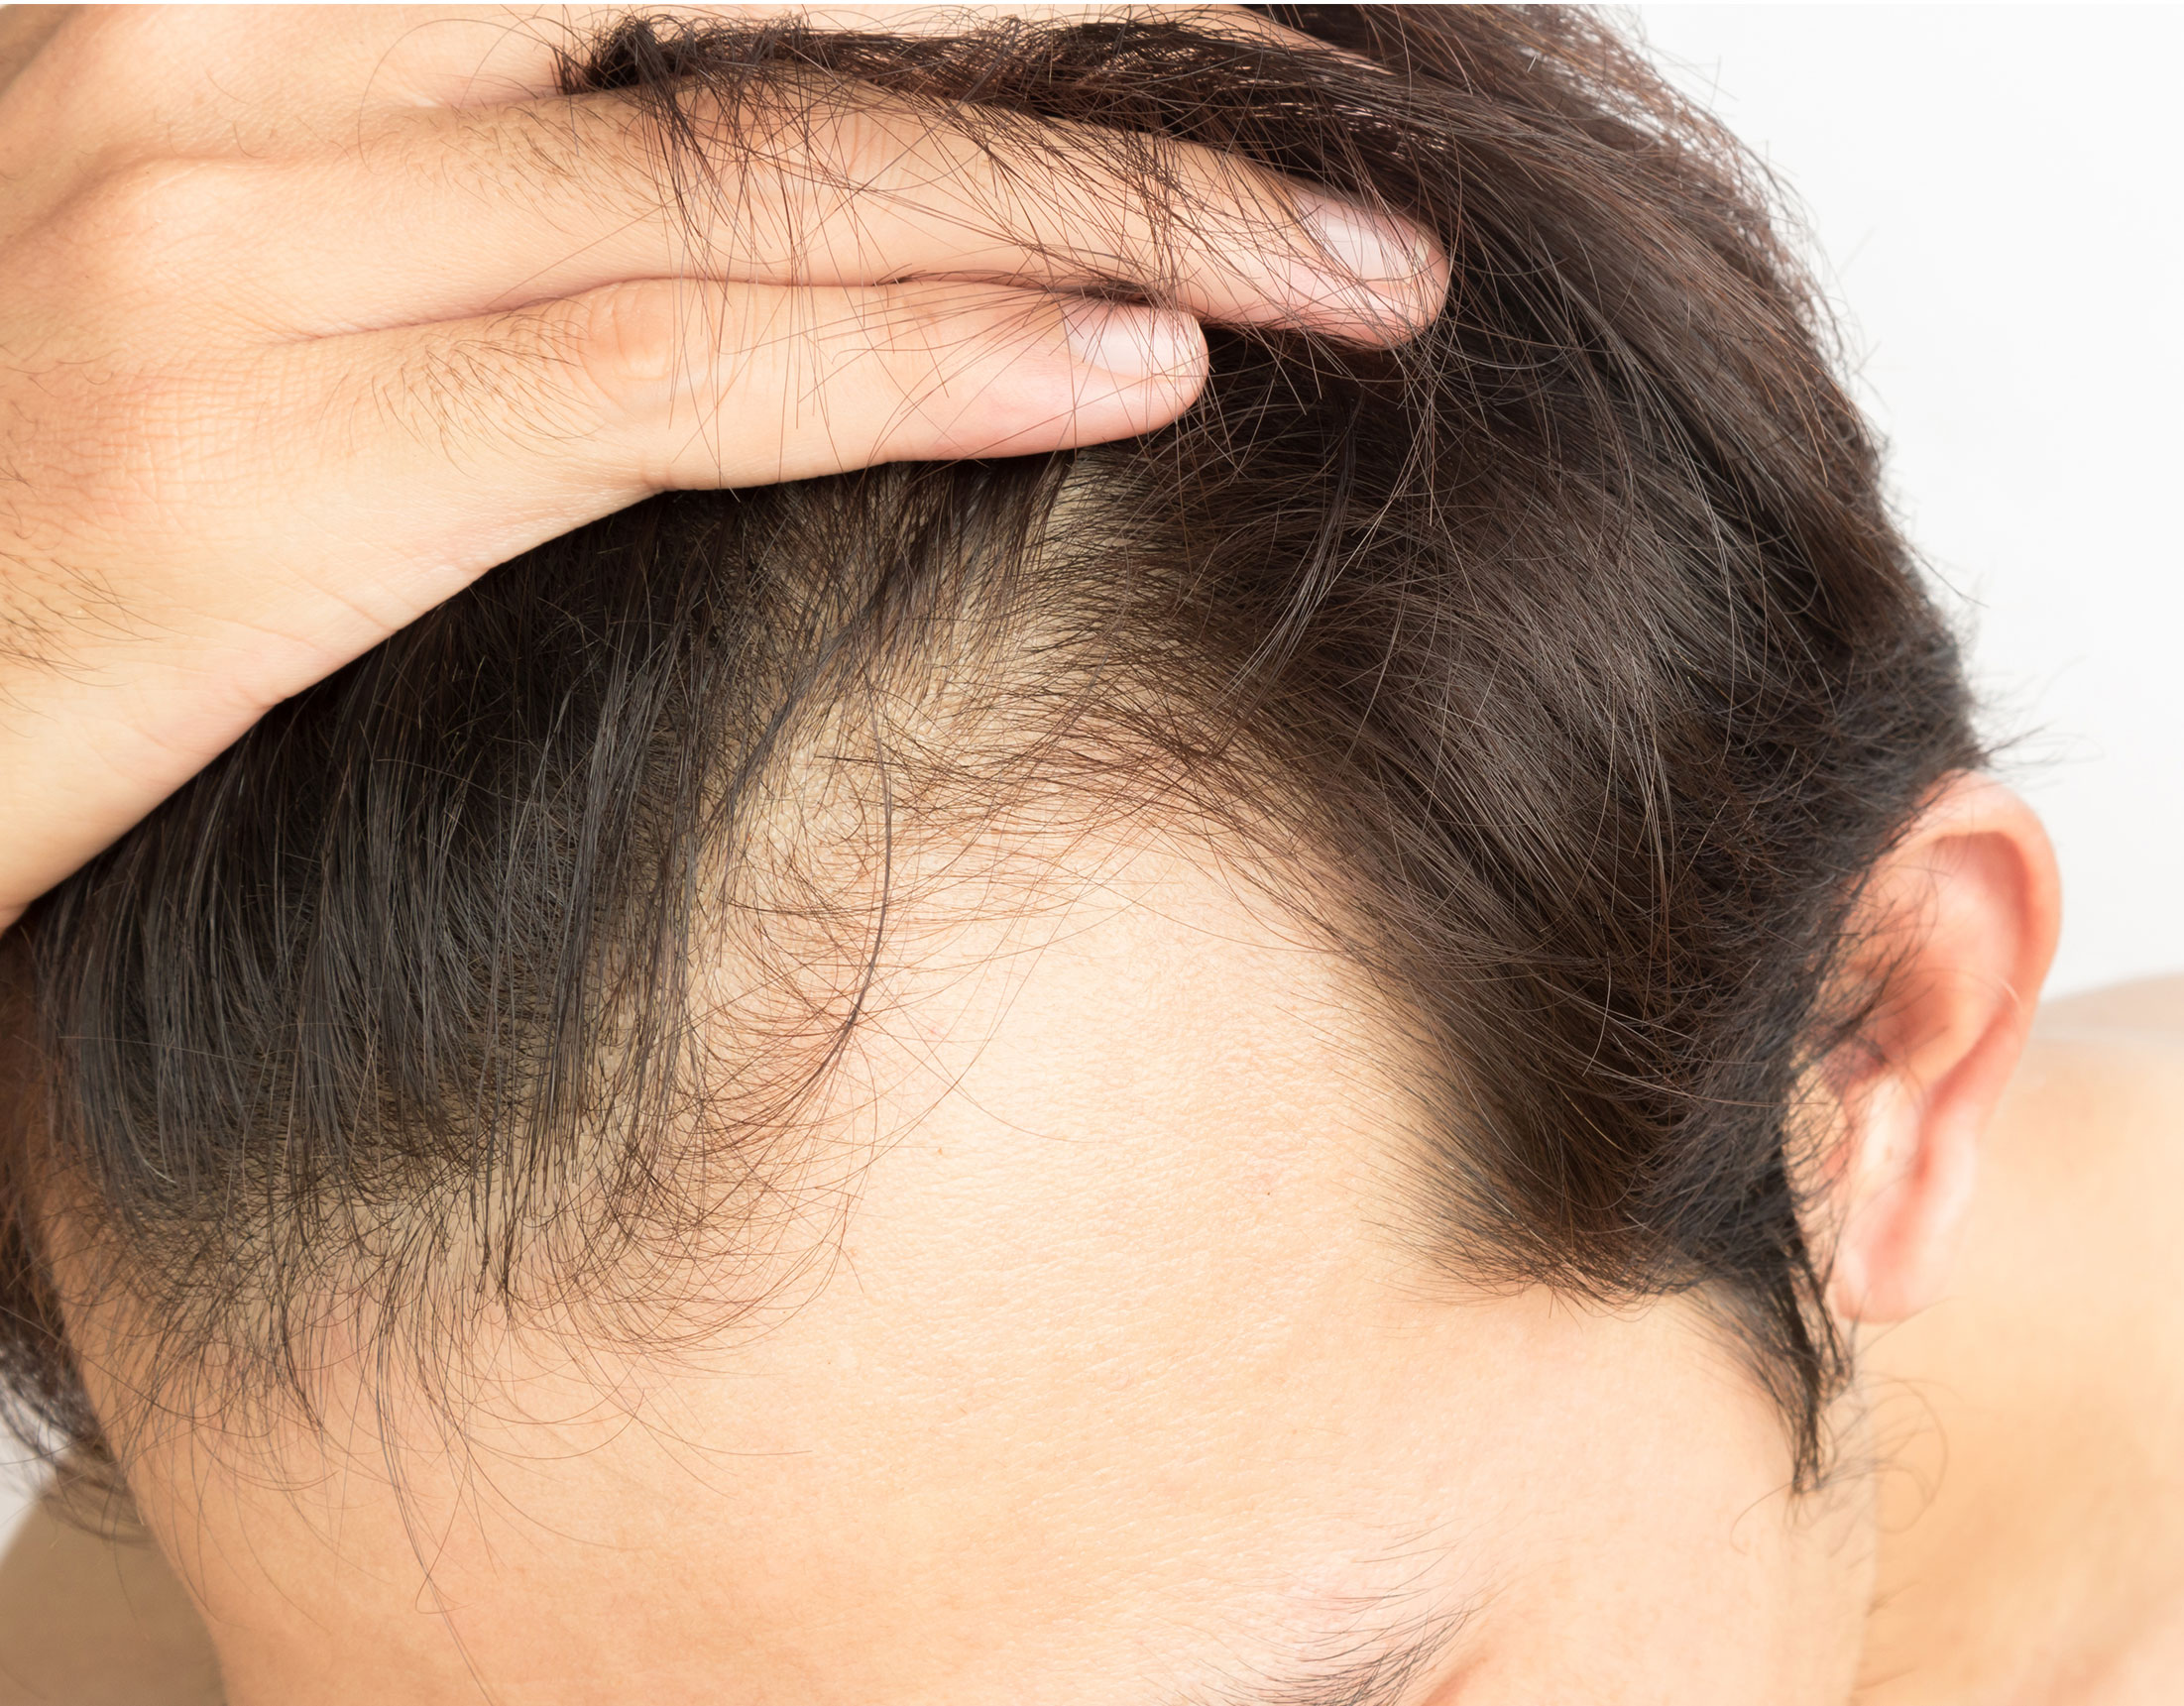 hair-problems-list